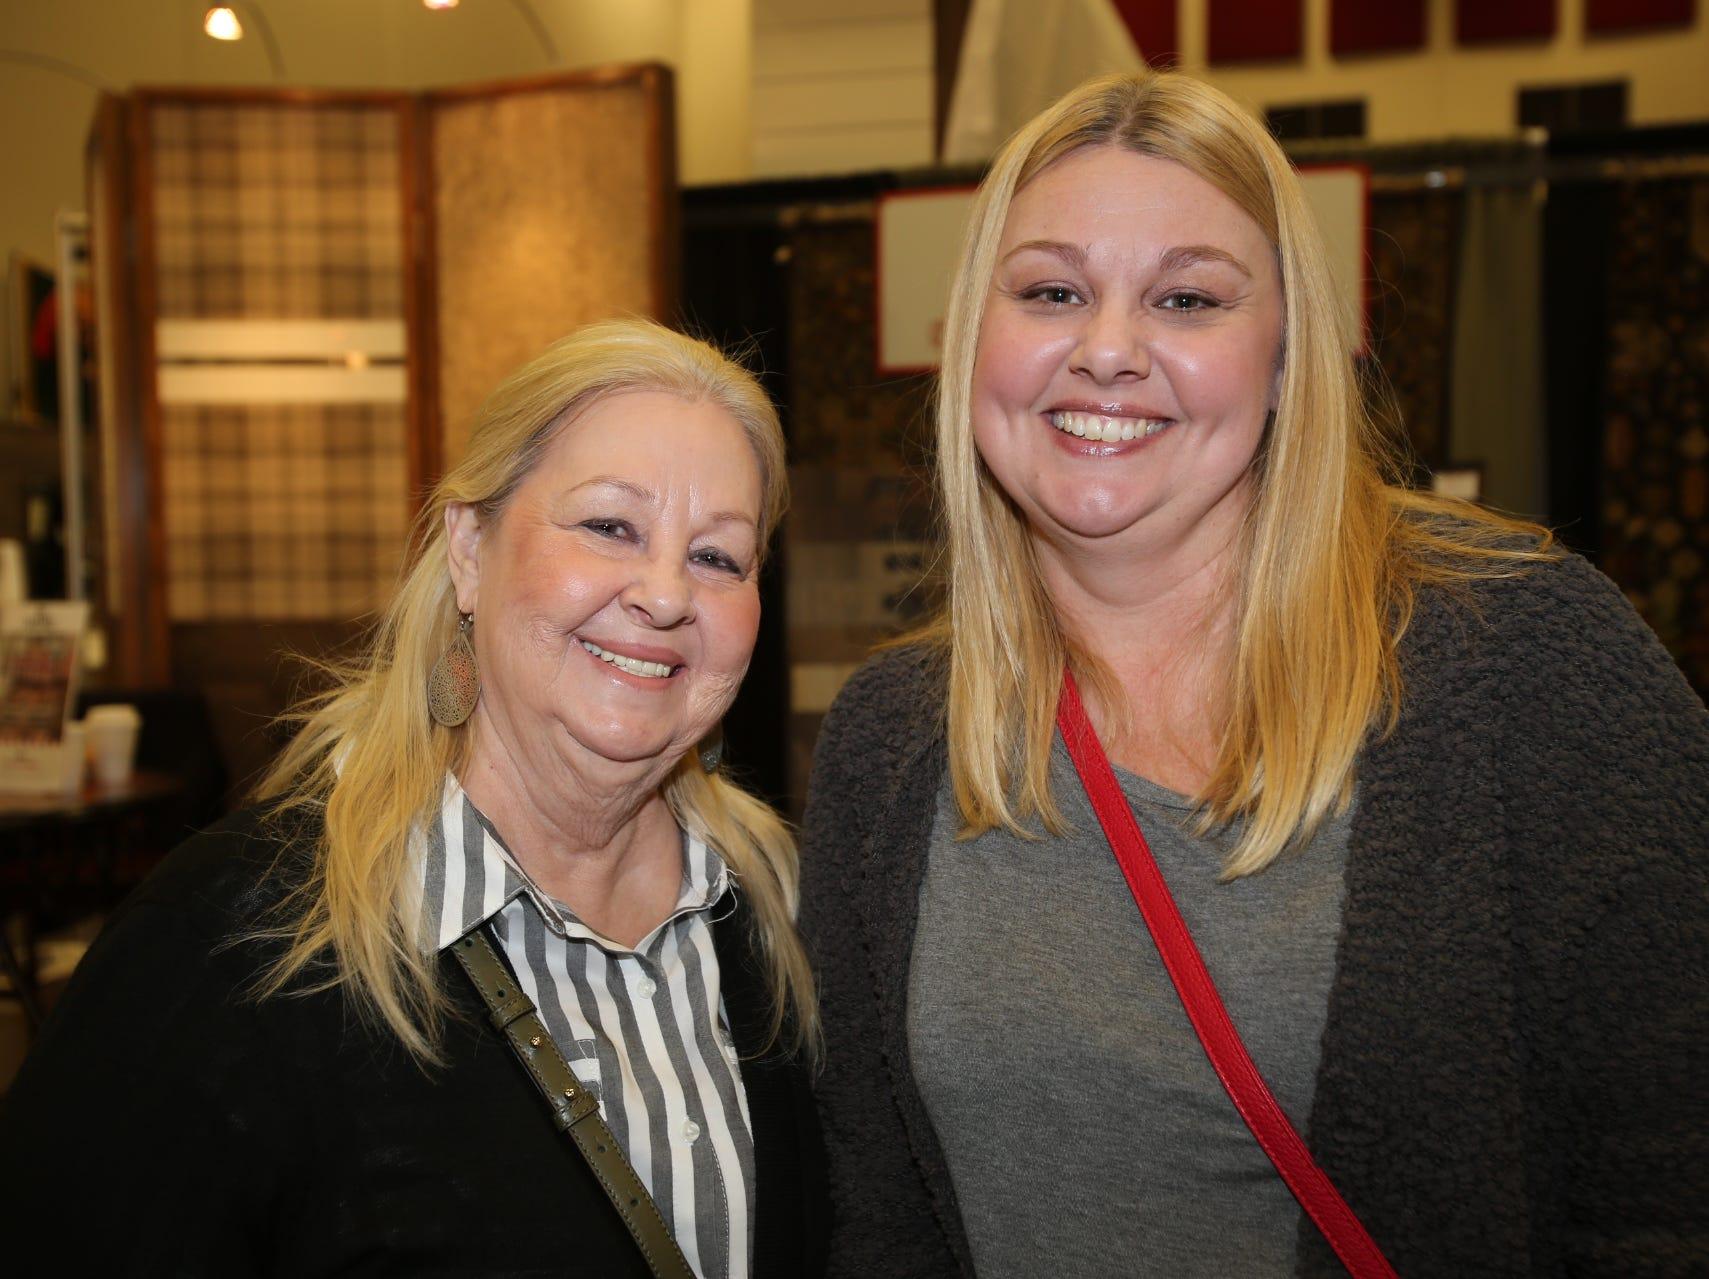 Sharon Willoughby and Kim Robinson